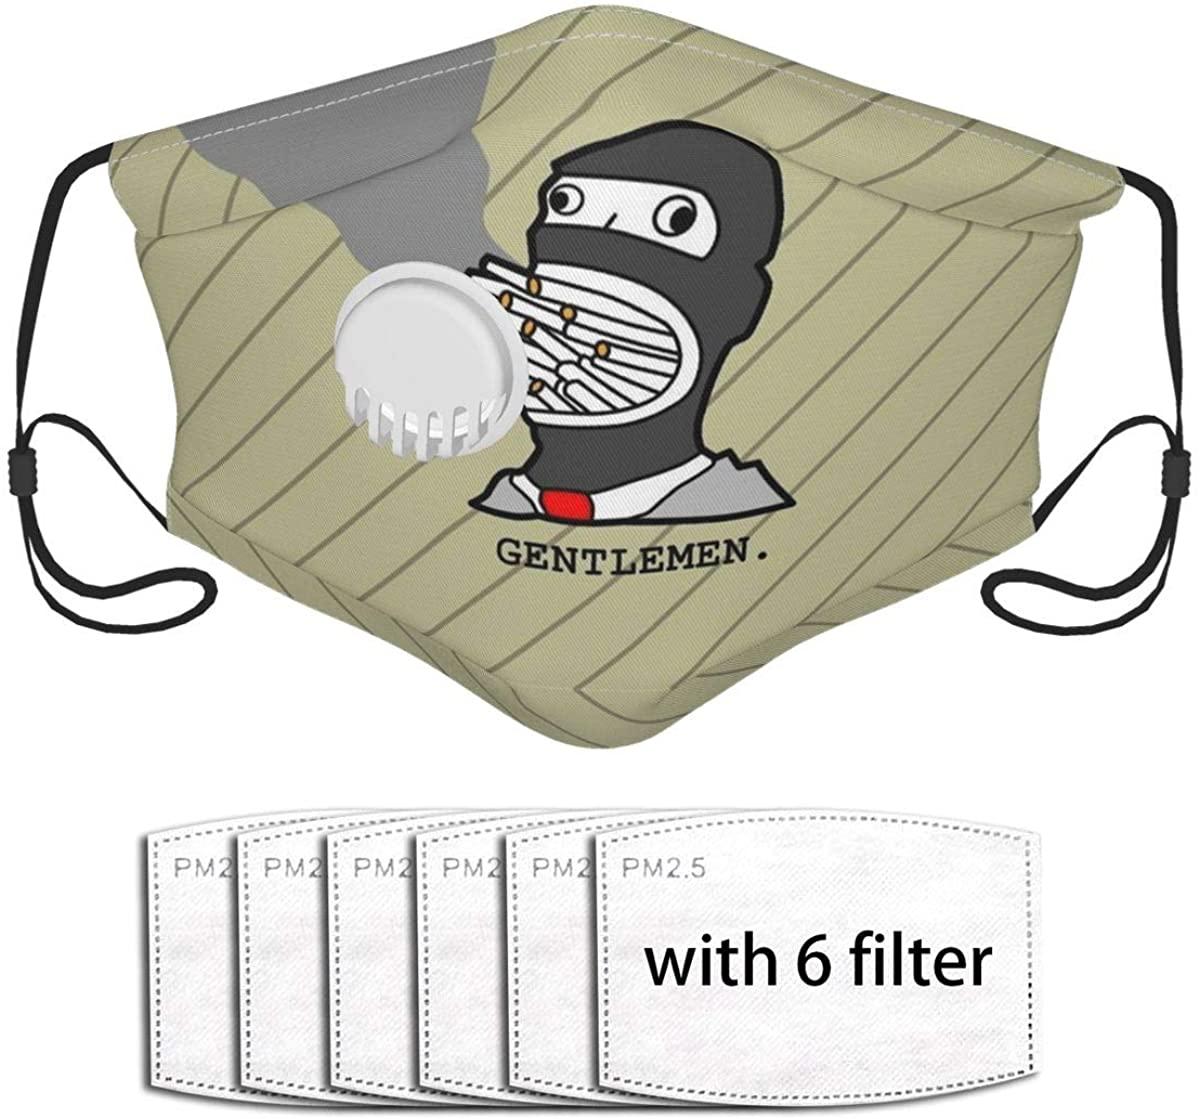 Cloth Me-me Face Mask Safety Reusable & Washable Anti Dust Mouth Fashion Balaclava.SAMBRIC dust Masks